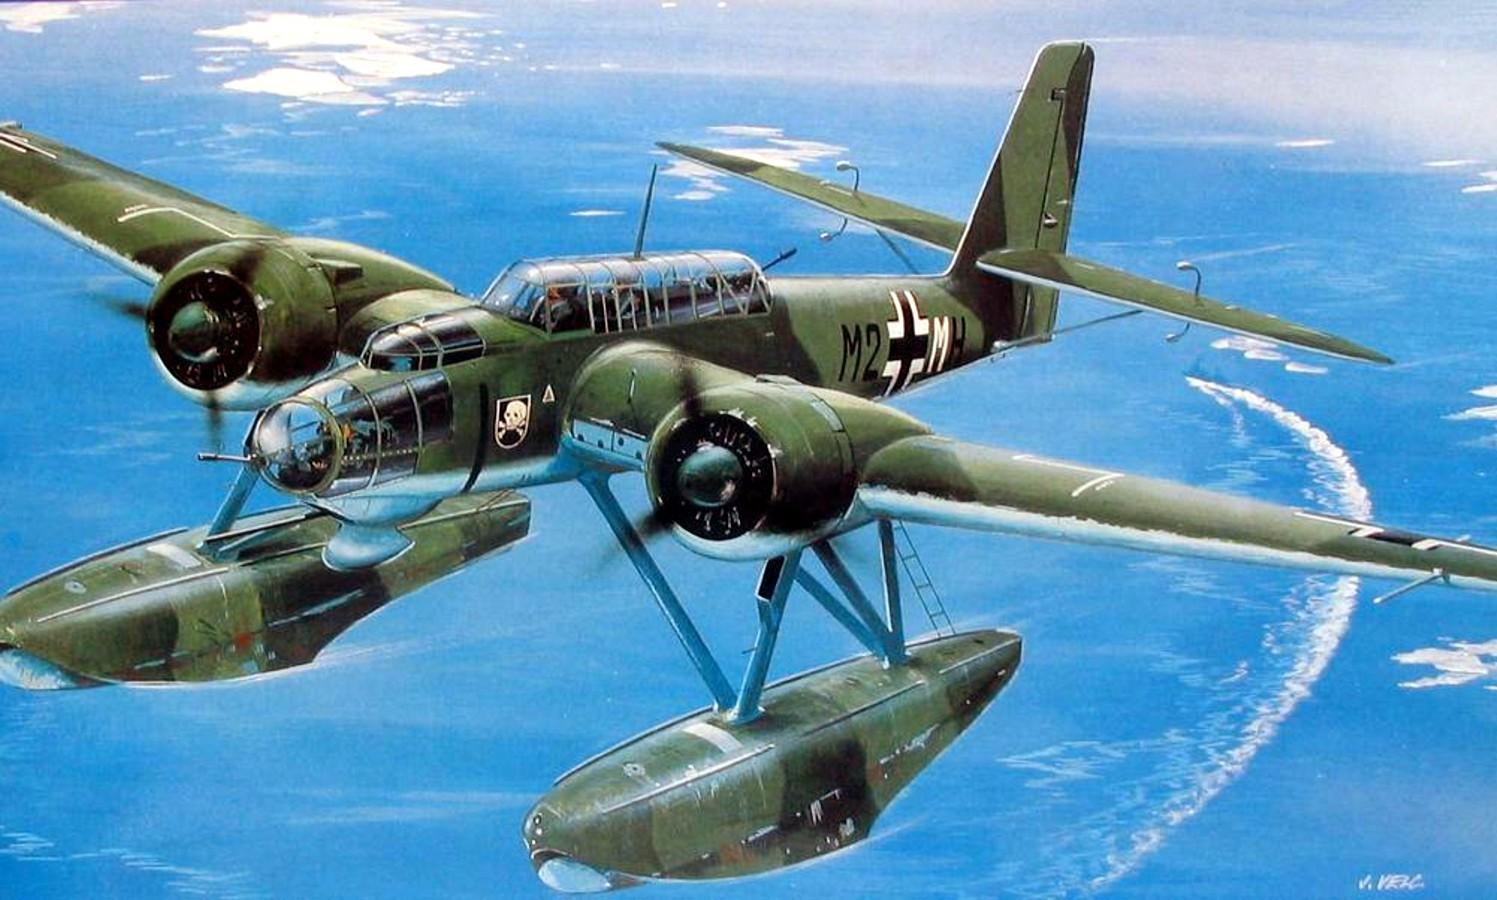 fond d 39 cran v hicule avion allemagne avion militaire la seconde guerre mondiale. Black Bedroom Furniture Sets. Home Design Ideas